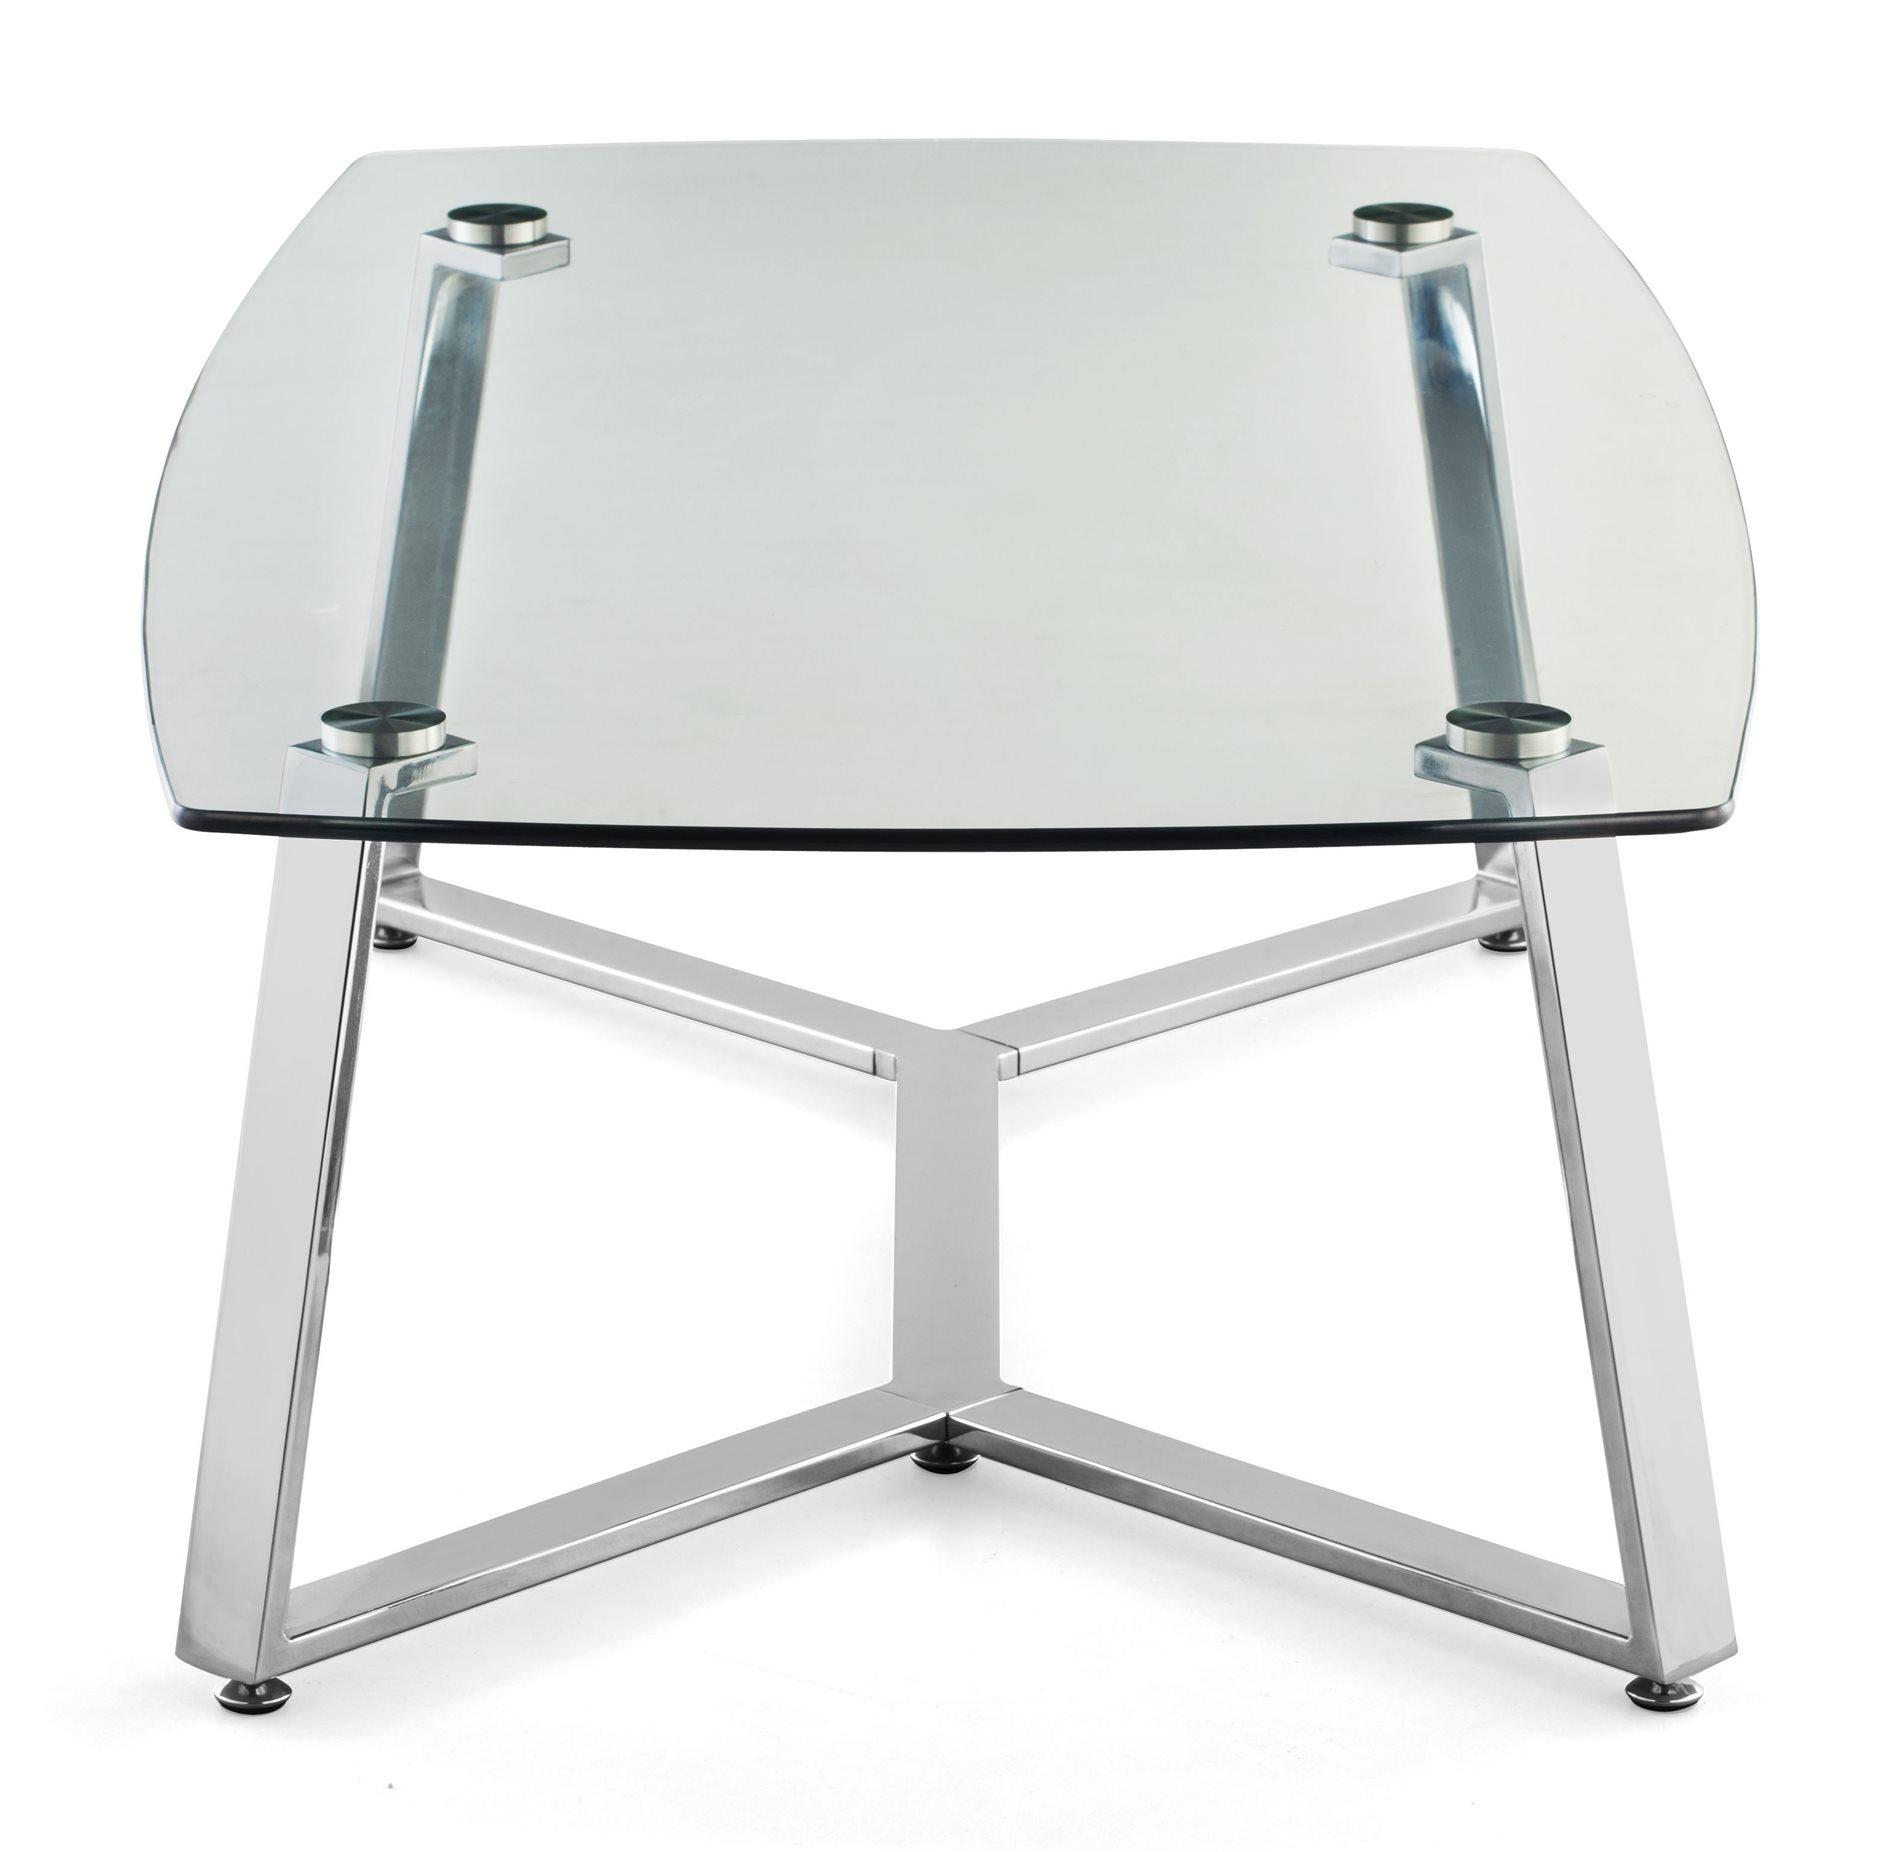 Zuo modern 102135 lemon drop modern long coffee table zm for Zuo coffee tables